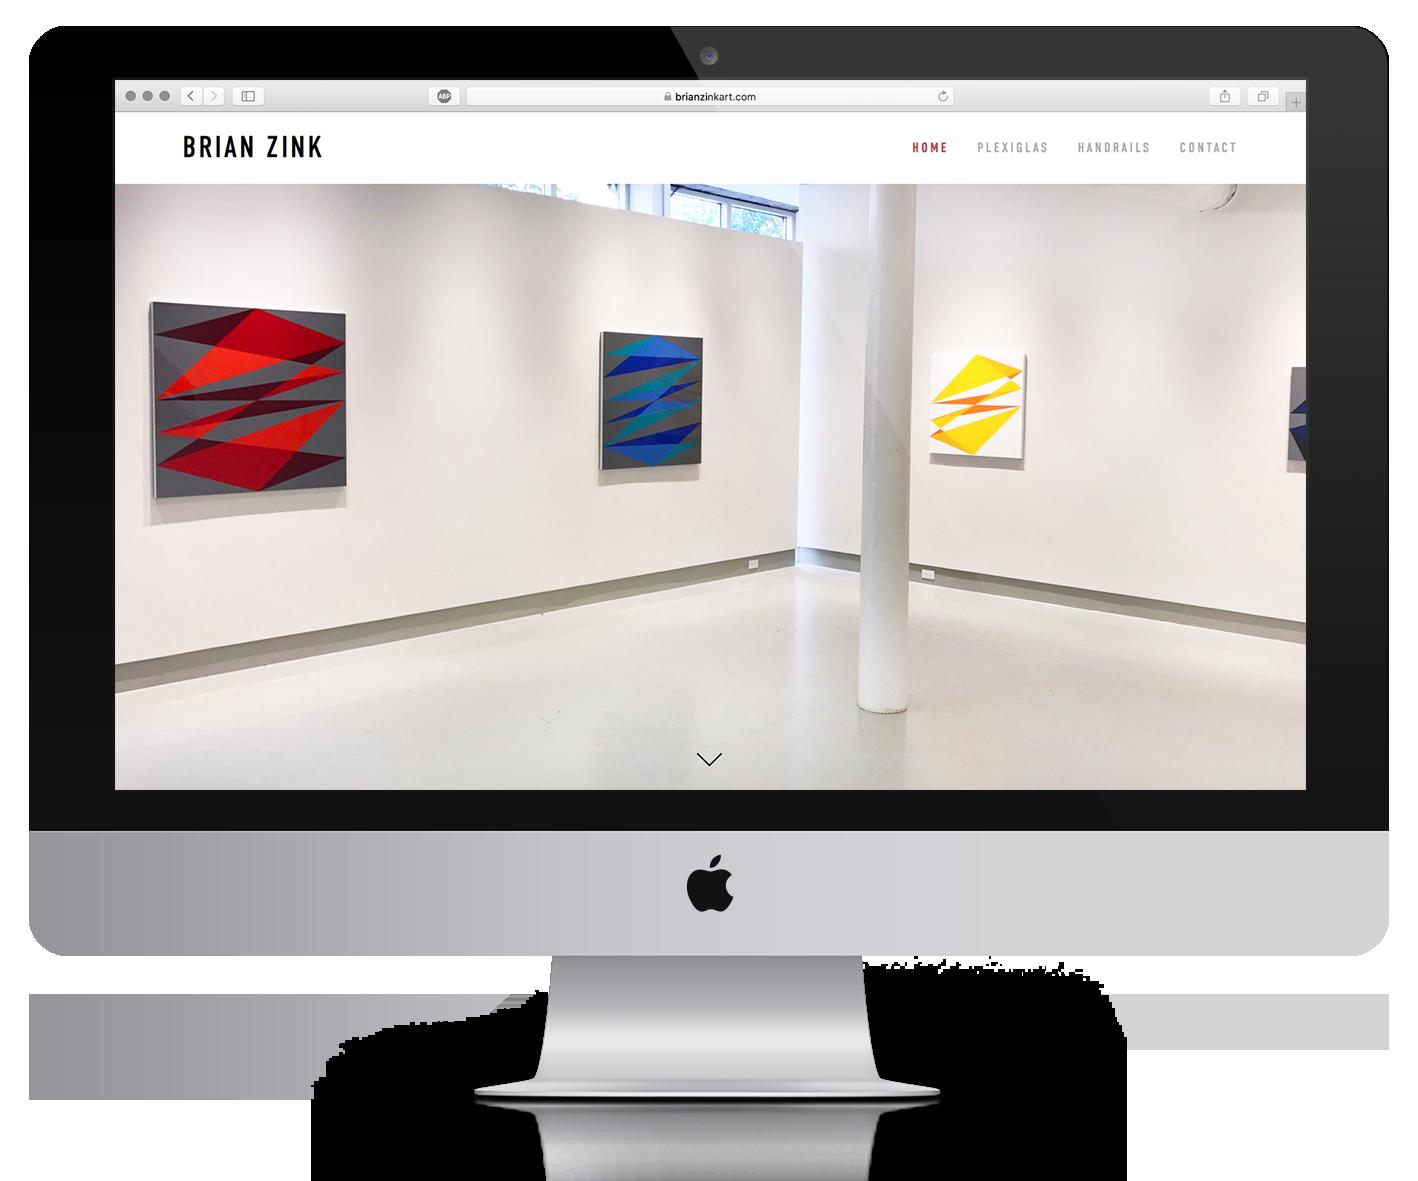 Website by Creative Katz